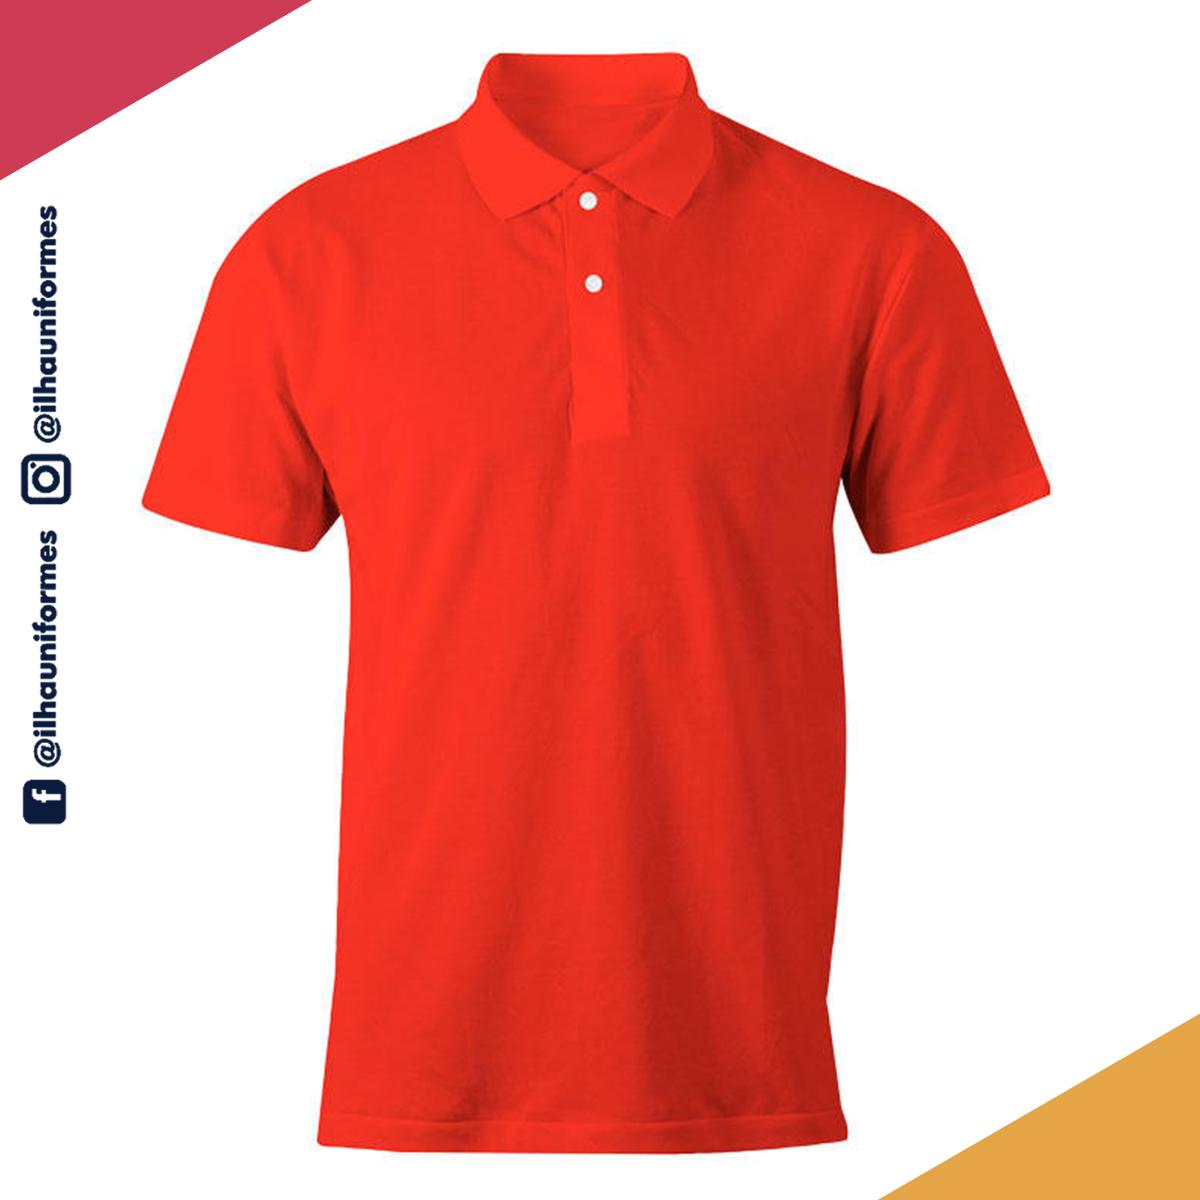 aab00780bb6 Camisa Gola Polo Dry – Ilha Uniformes